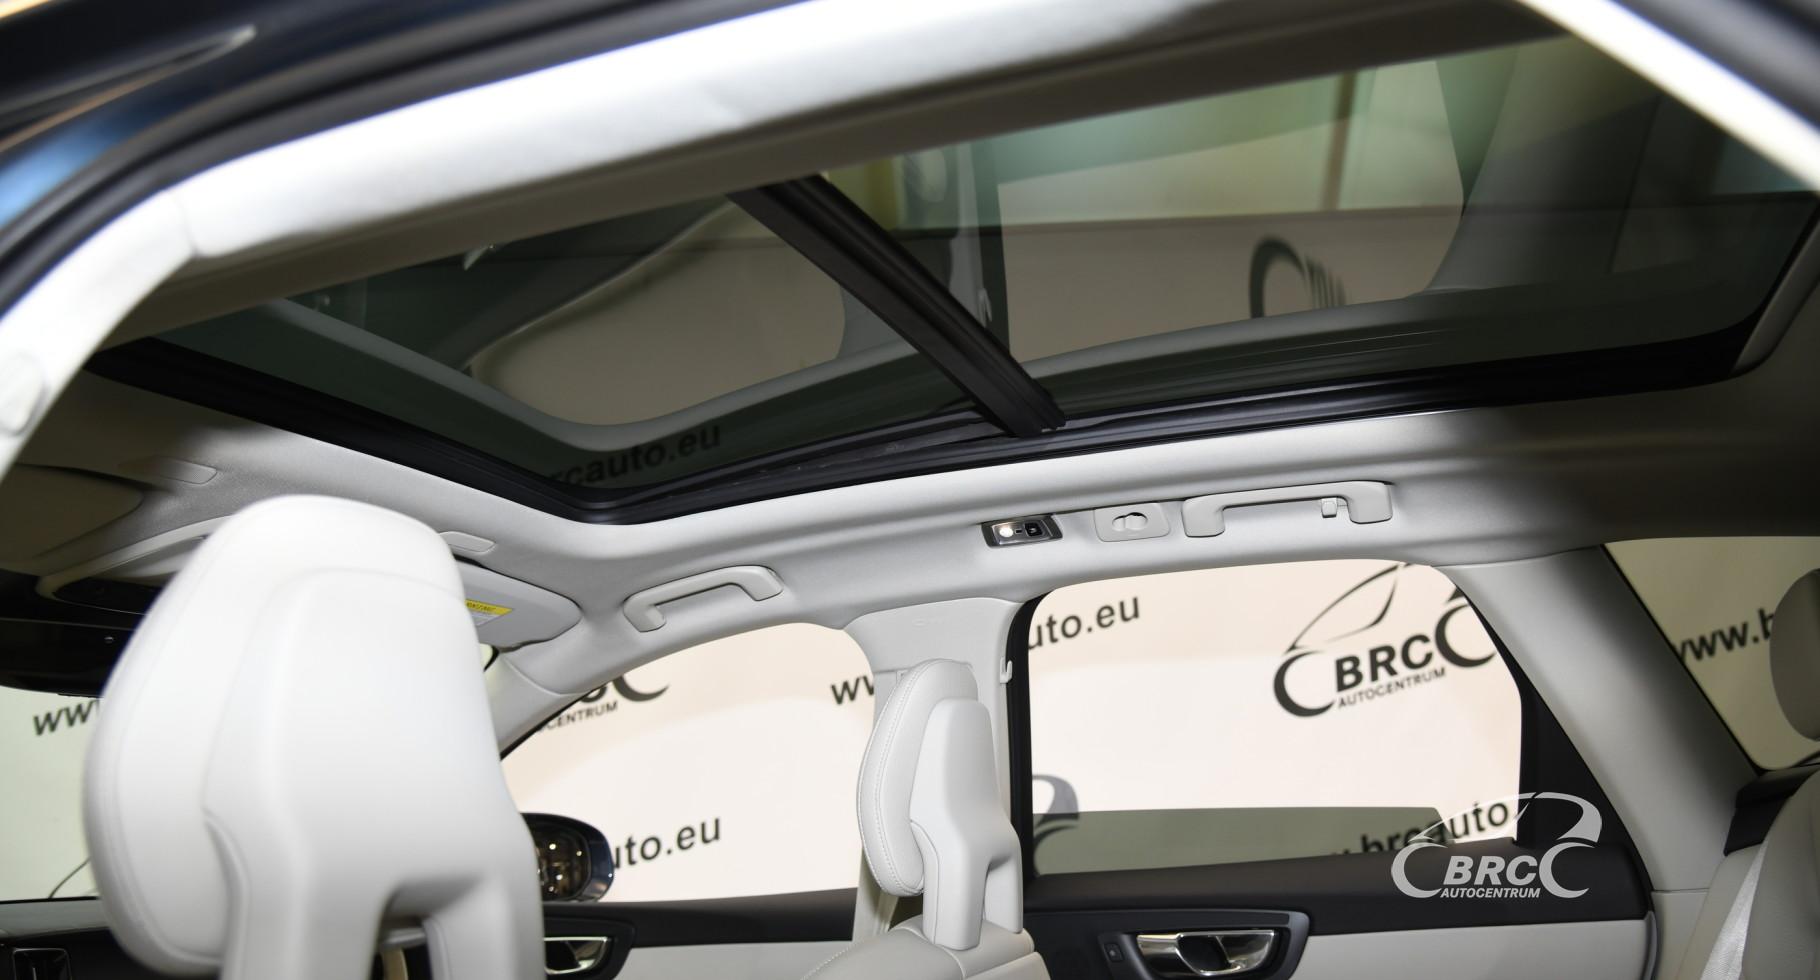 Volvo XC 60 2.0 T5 Inscription AWD Automatas